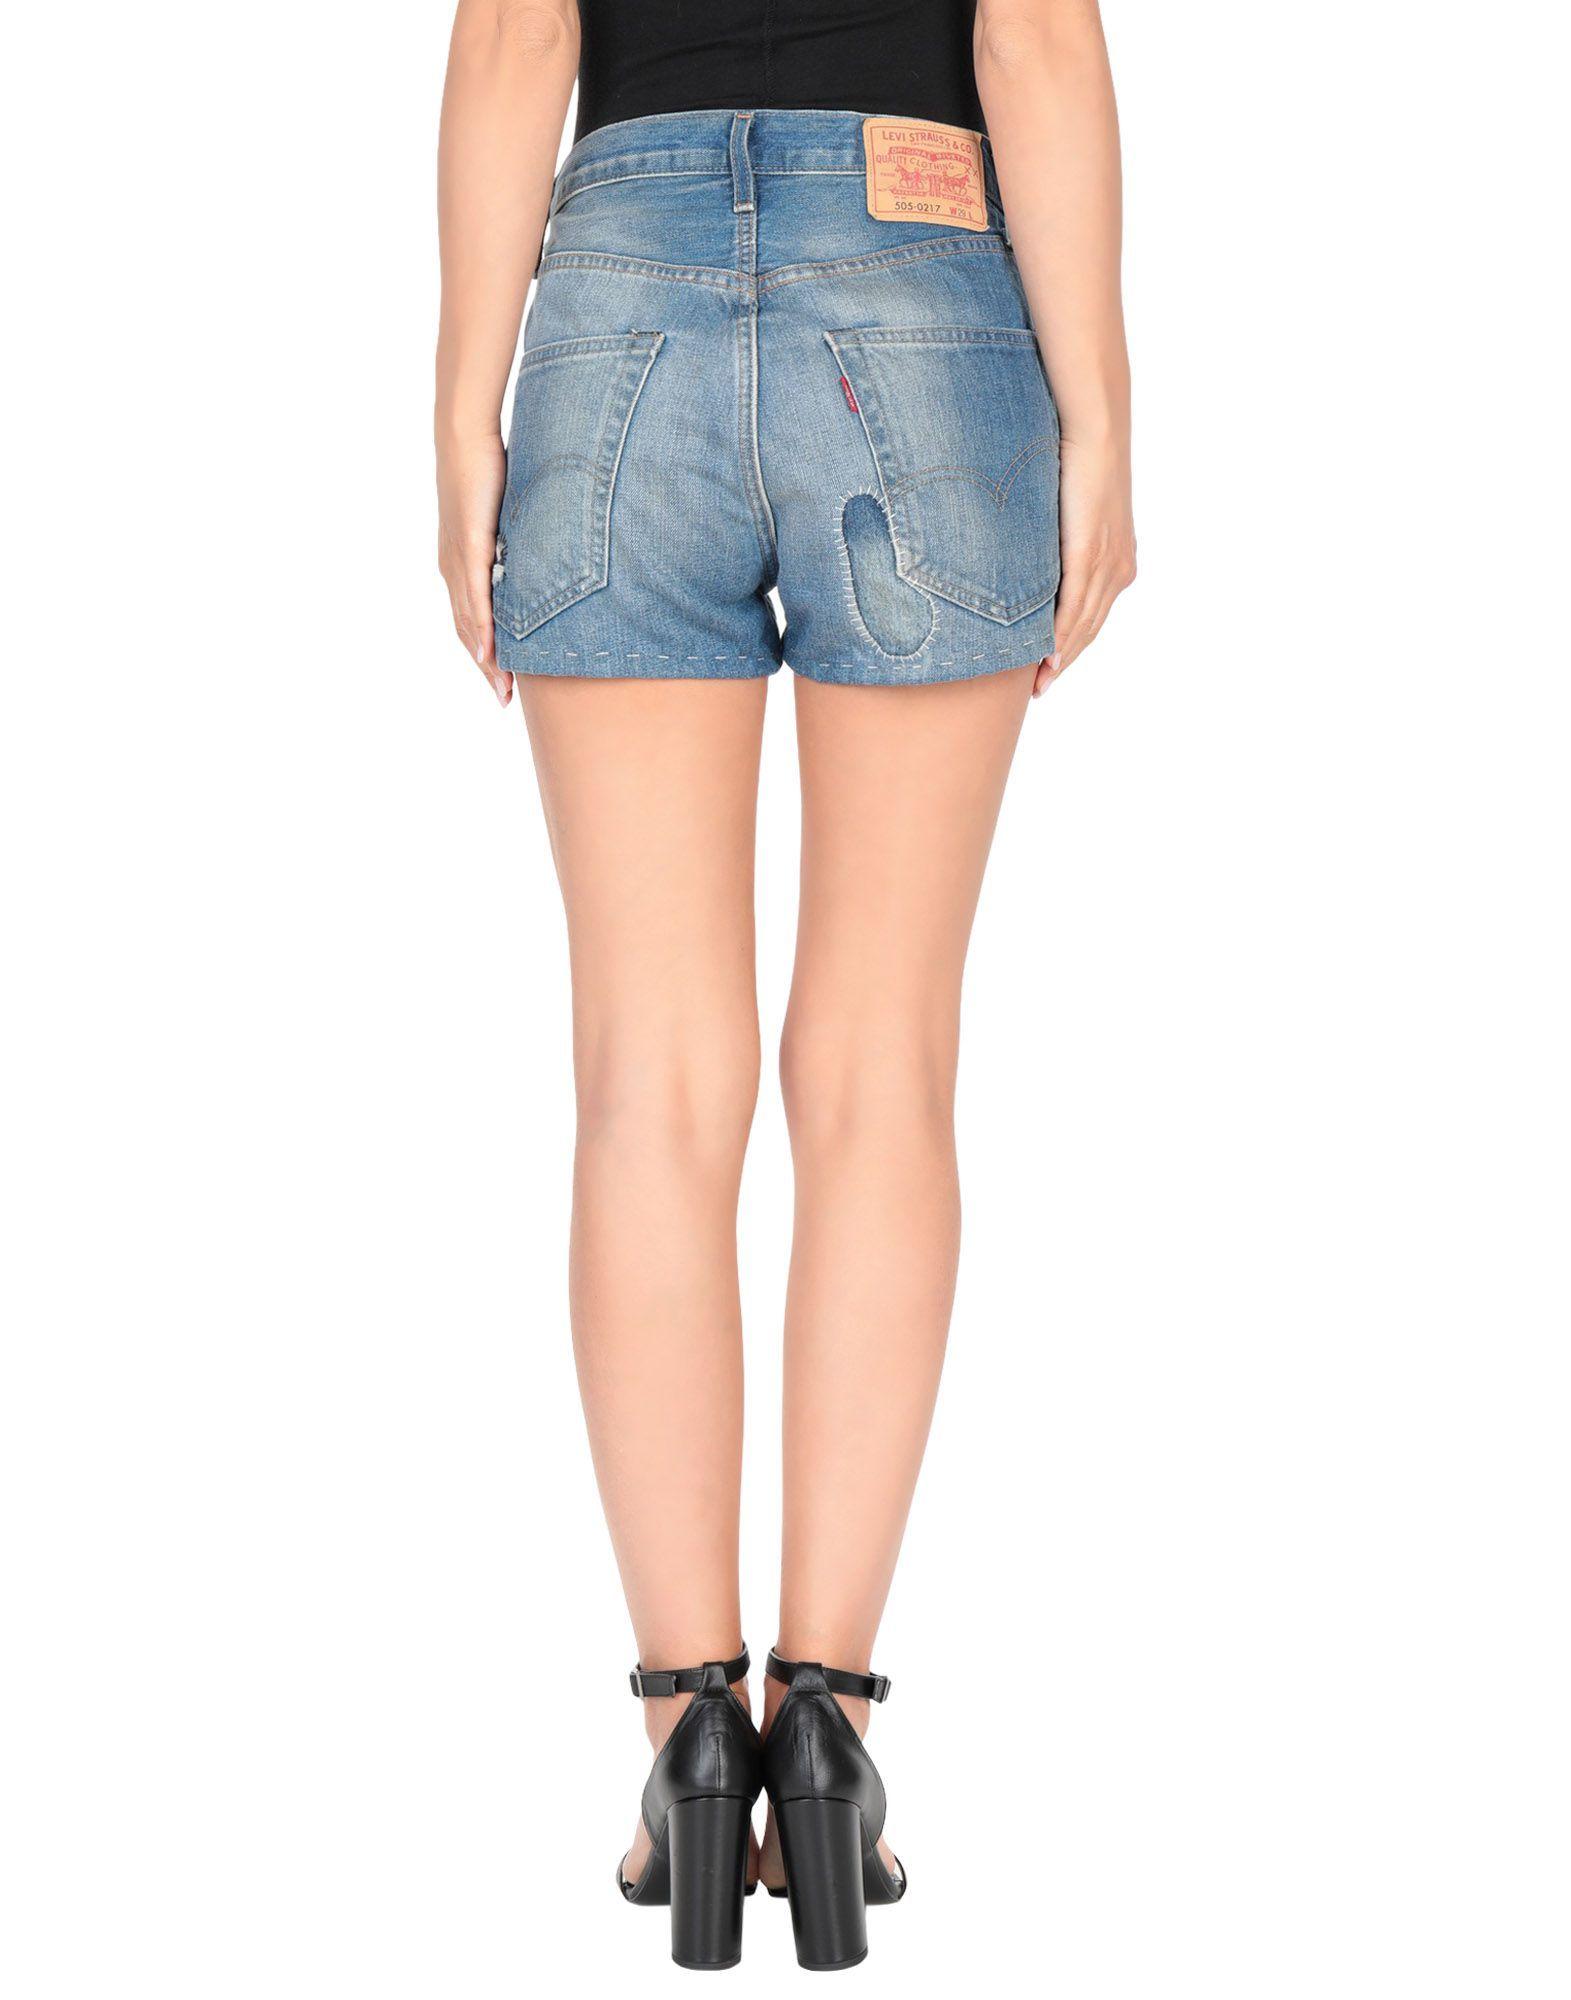 Levi's Blue Denim Shorts